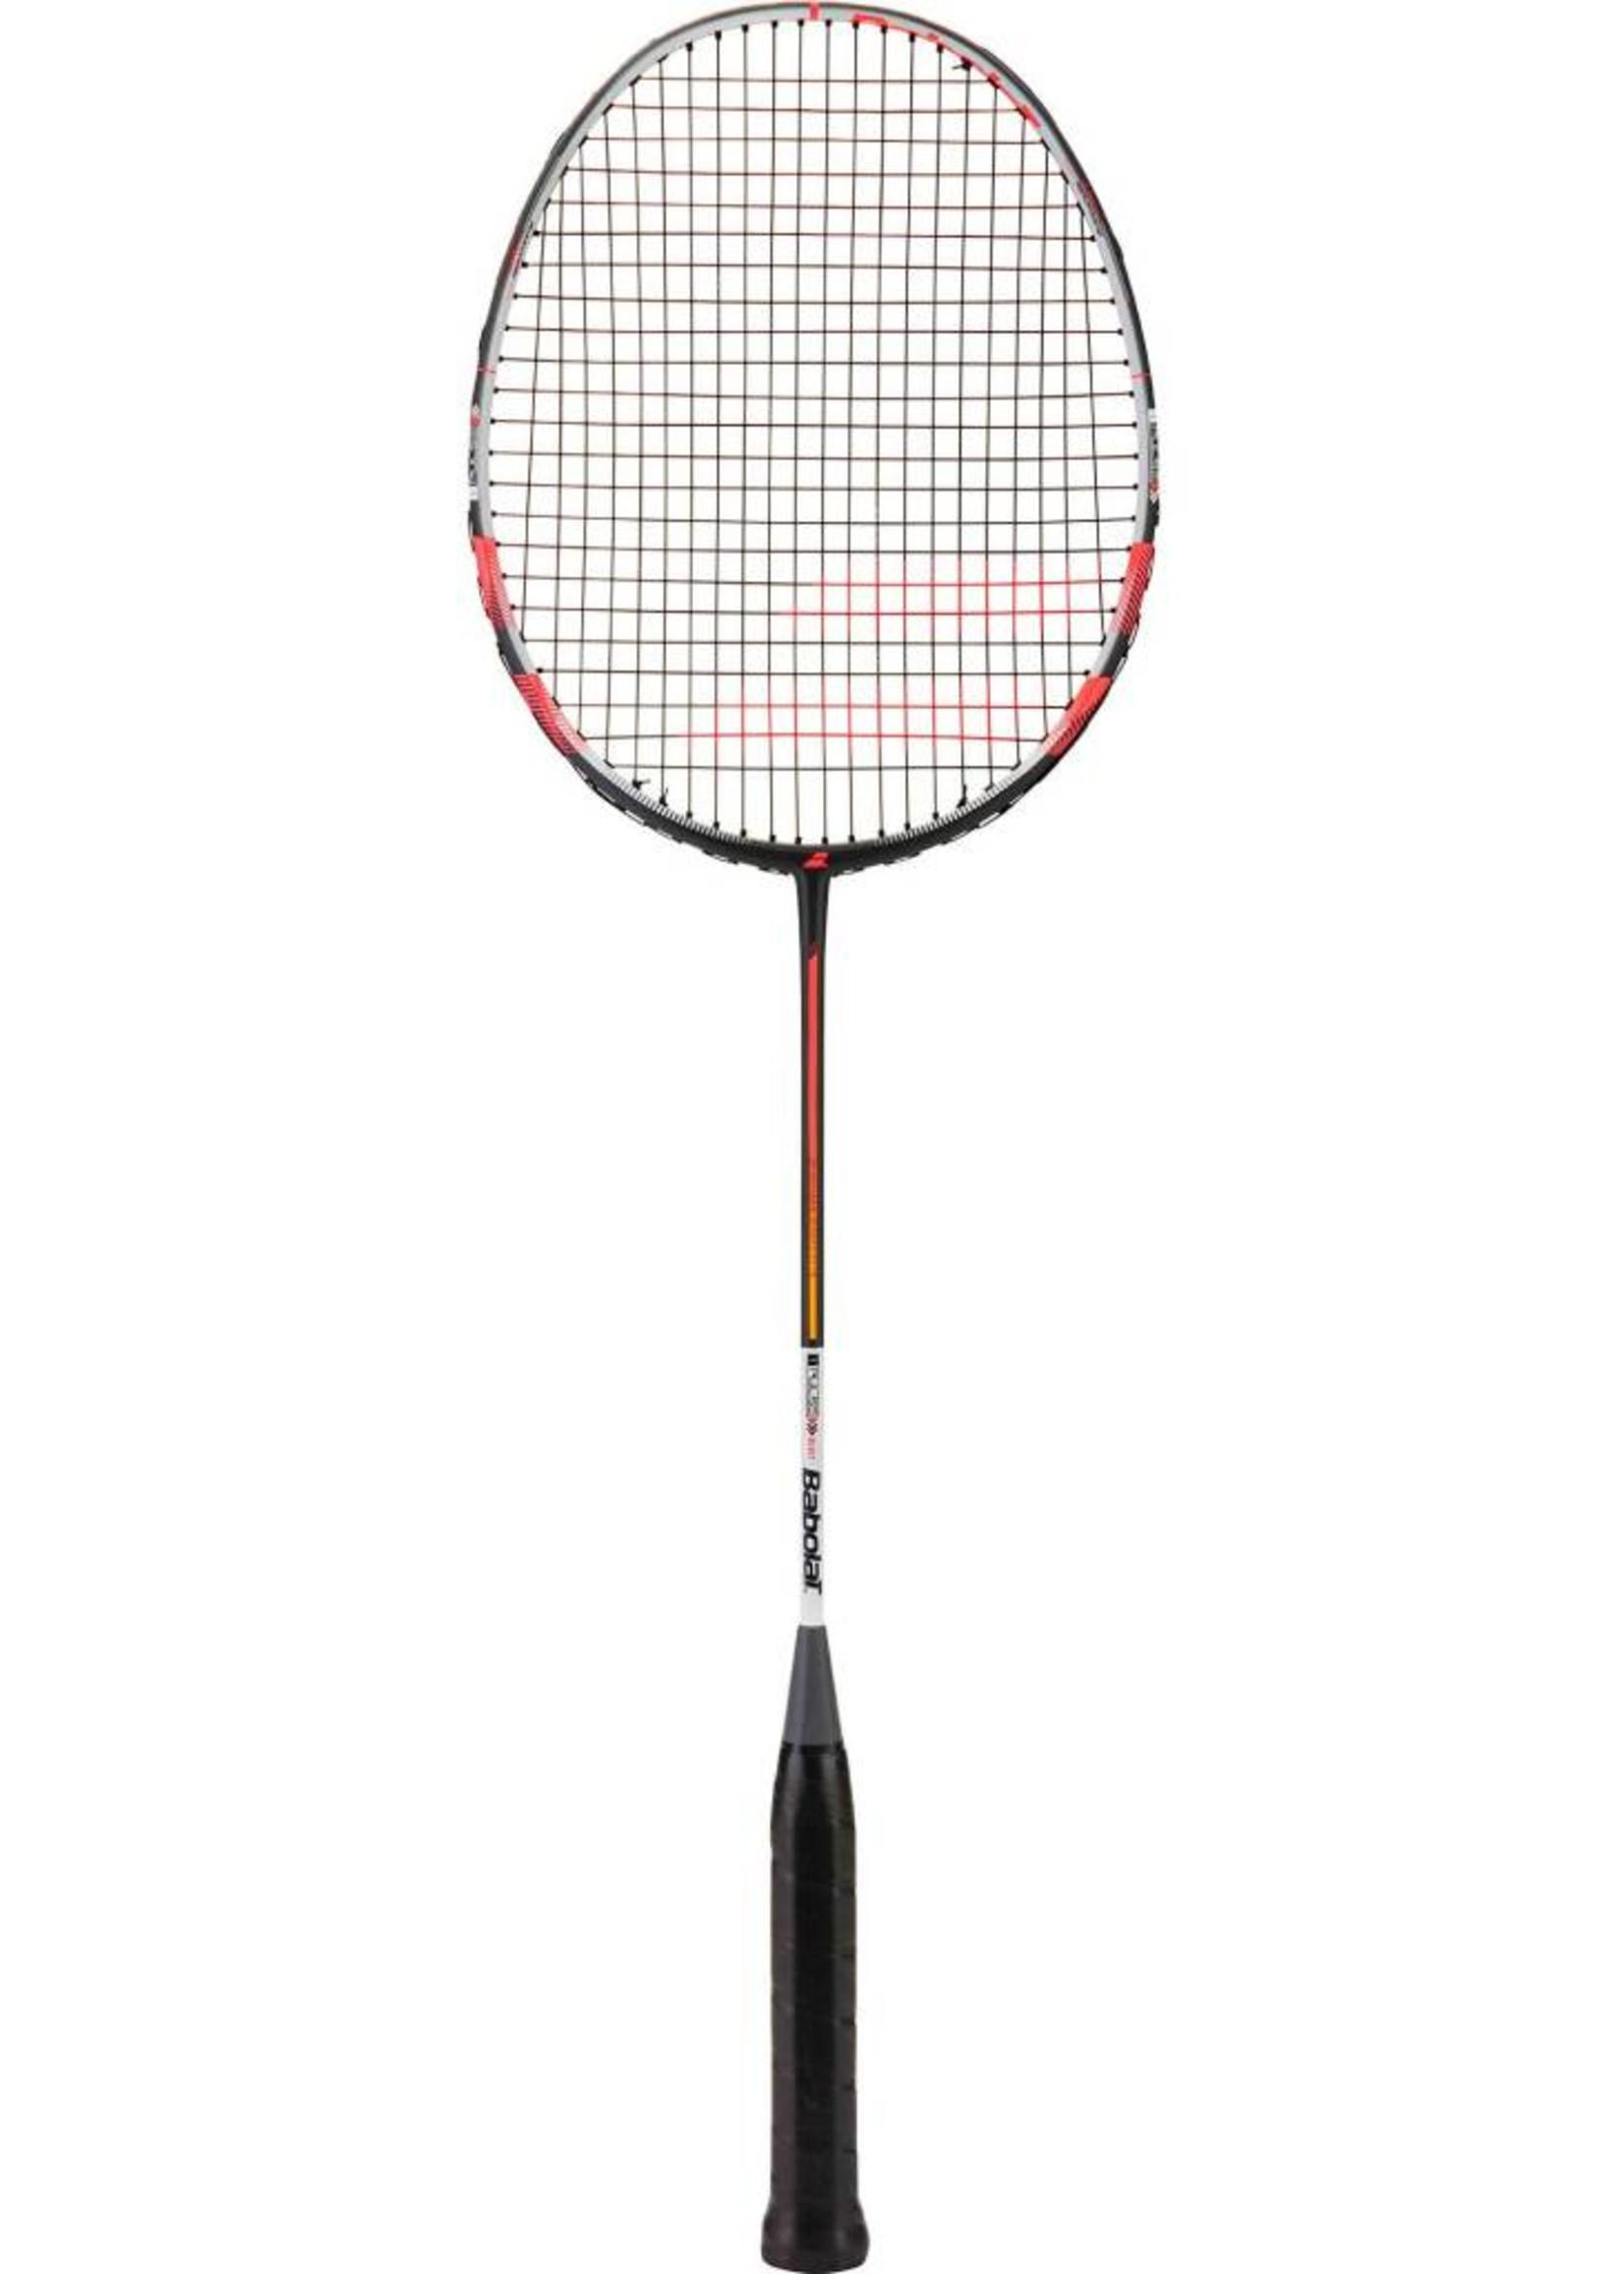 Babolat Babolat I-Pulse Blast Badminton Racket (2019)